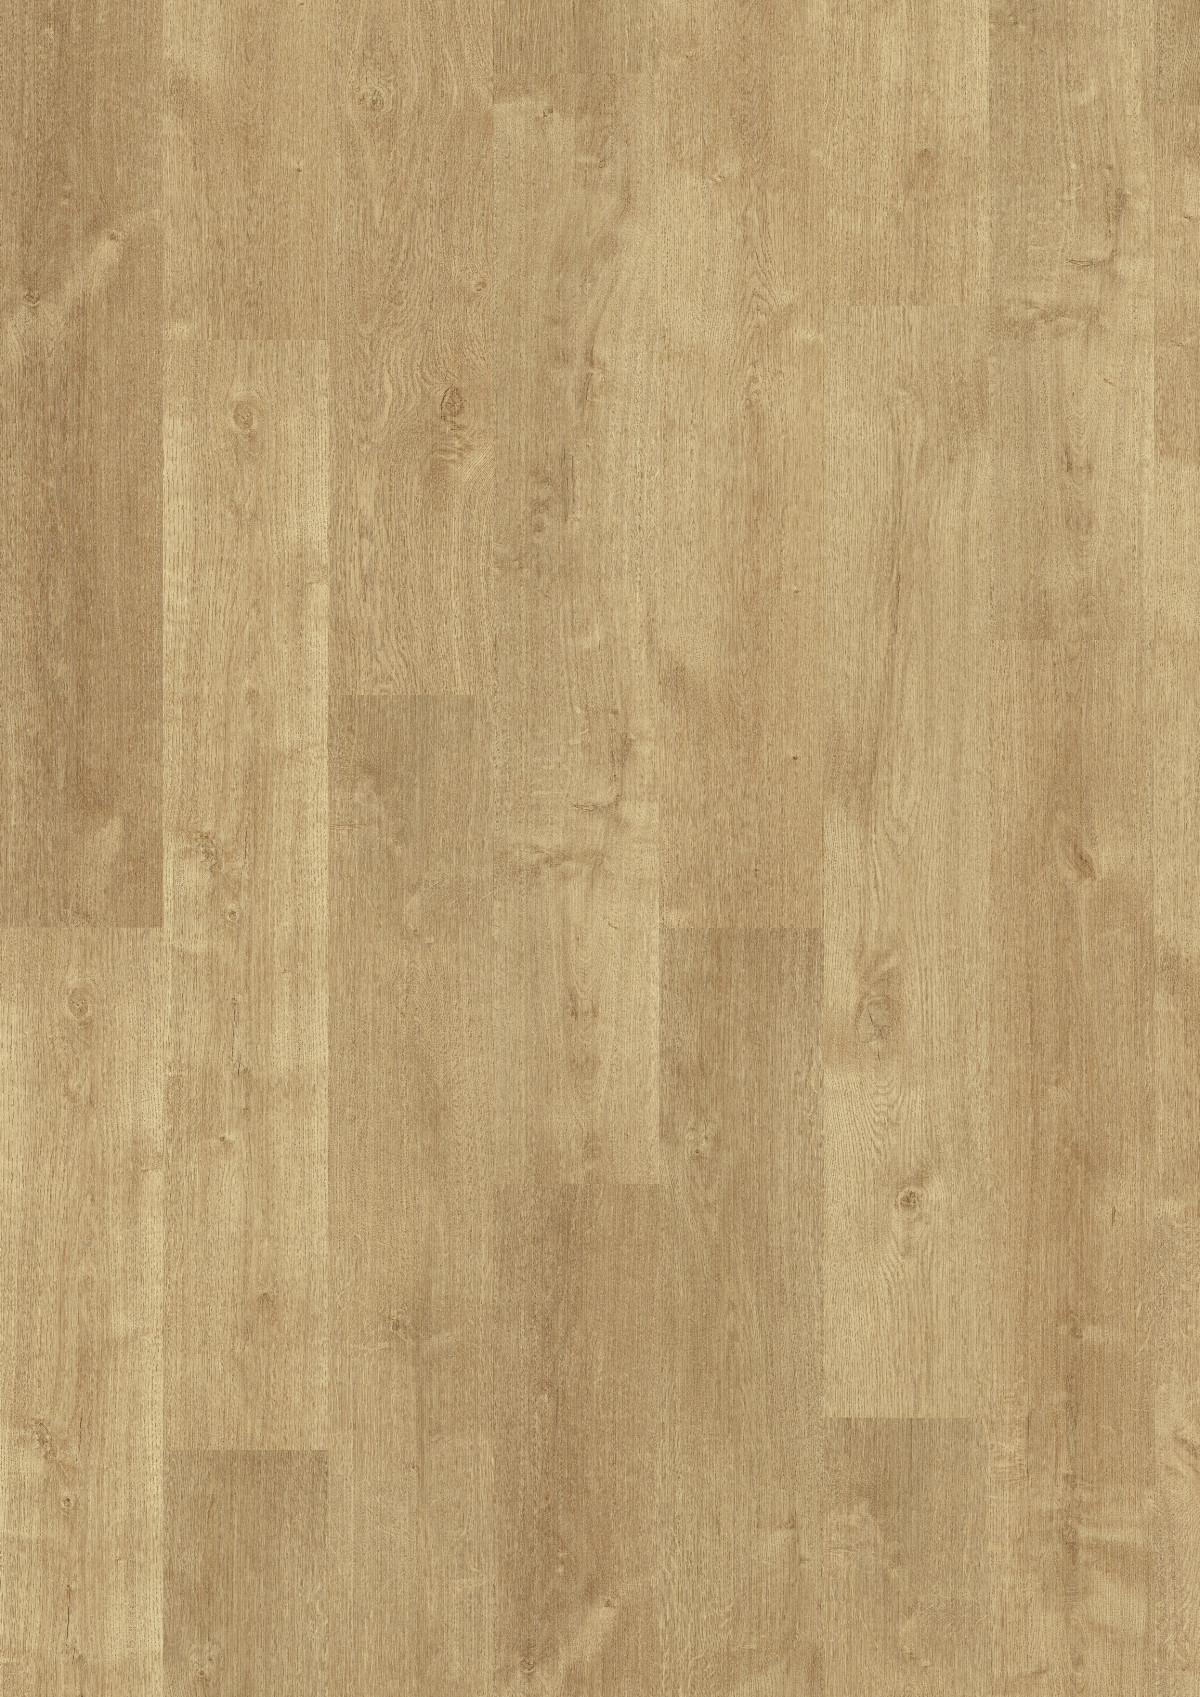 laminat lnge amazing richtig verlegen foto with laminat lnge perfect laminat und wohngefhl. Black Bedroom Furniture Sets. Home Design Ideas